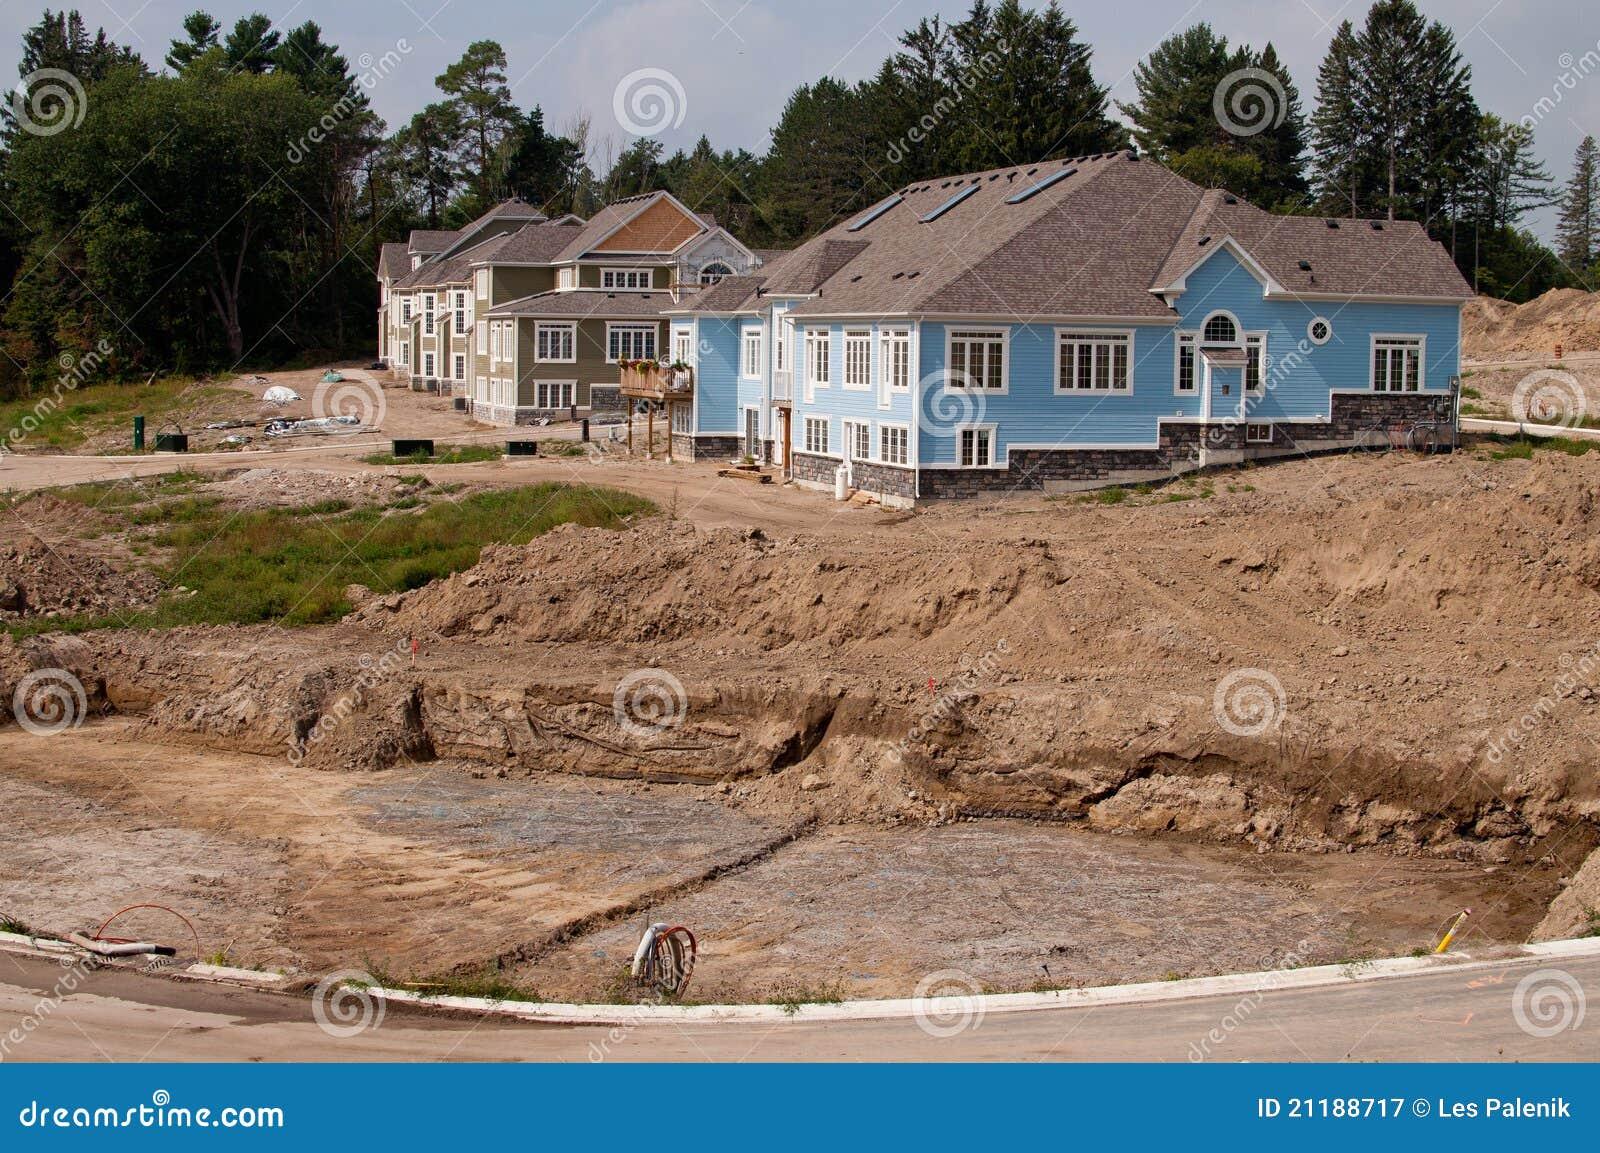 New house development